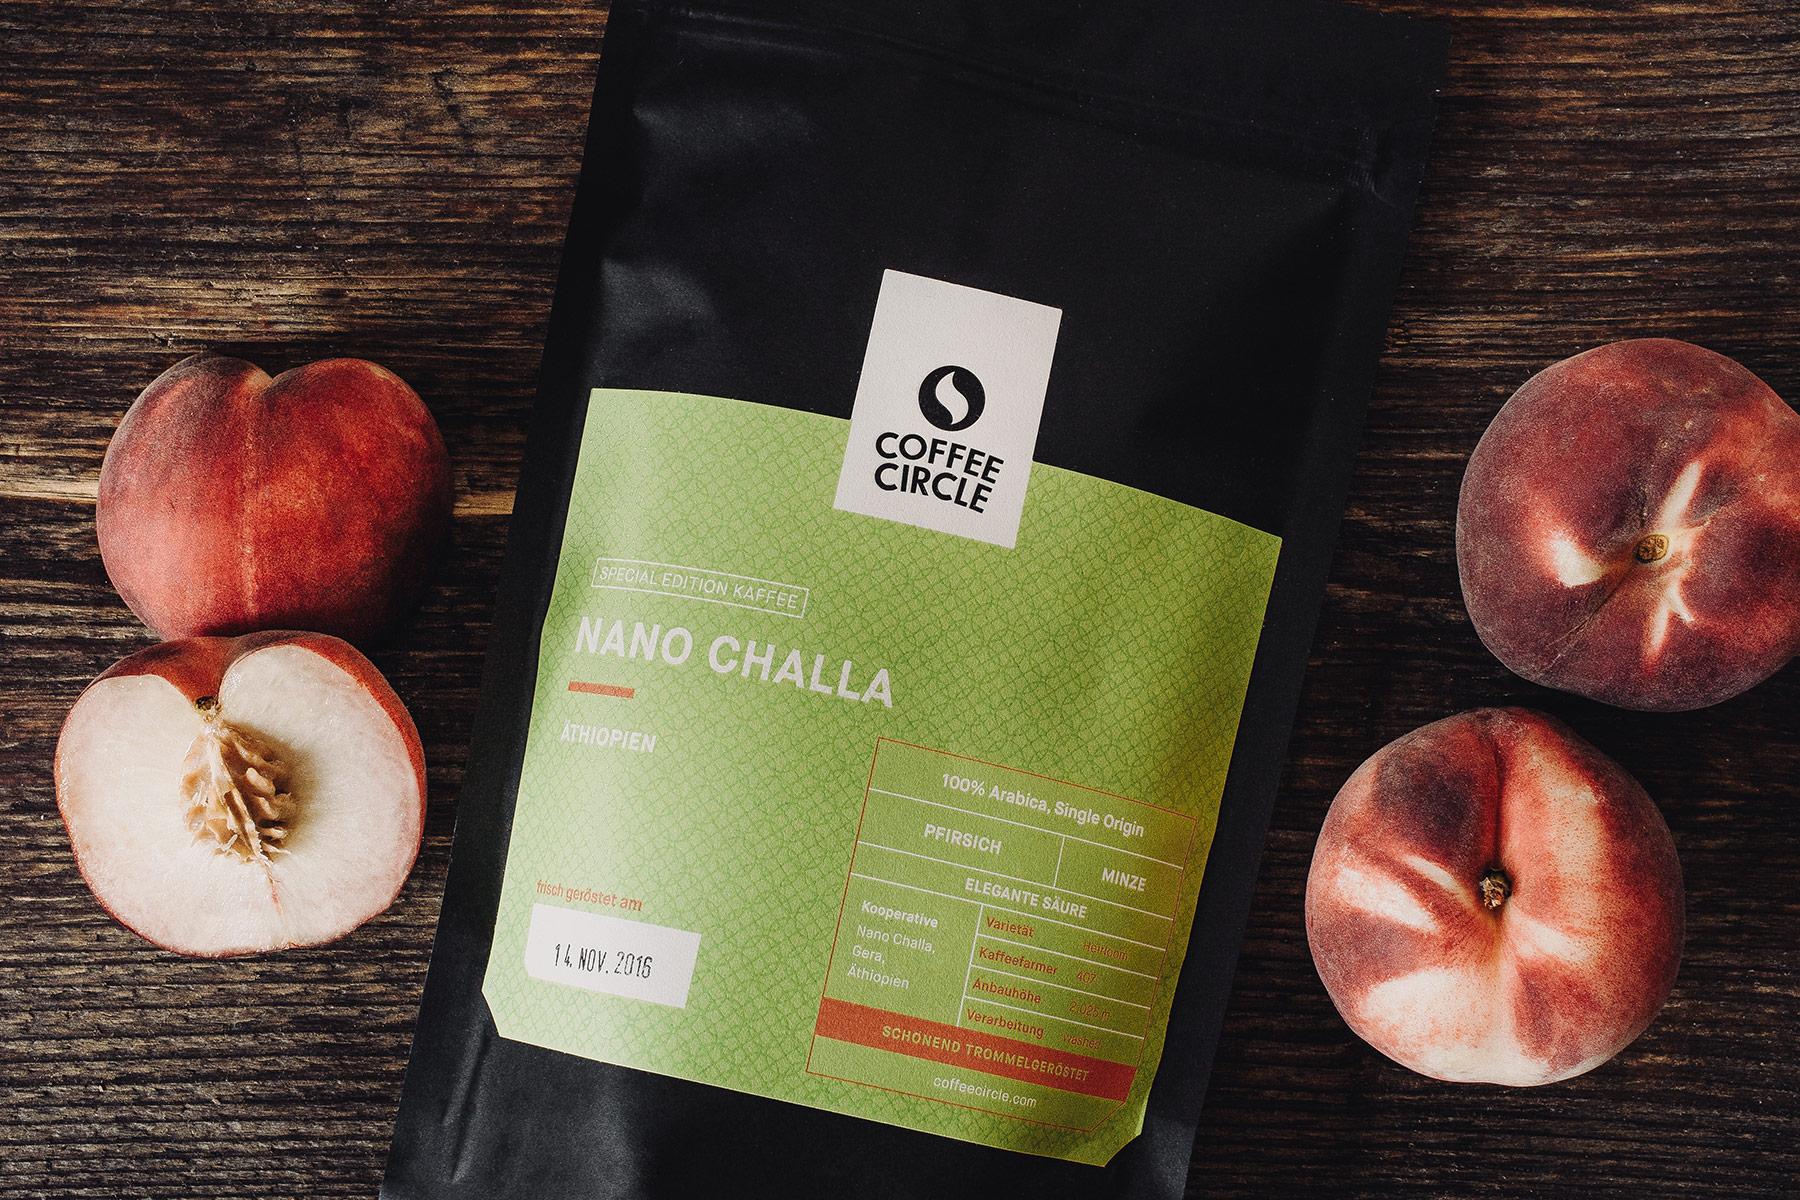 max-duchardt-m-a-a-x-coffeecircle-packaging-design-nano-challa-geschmack